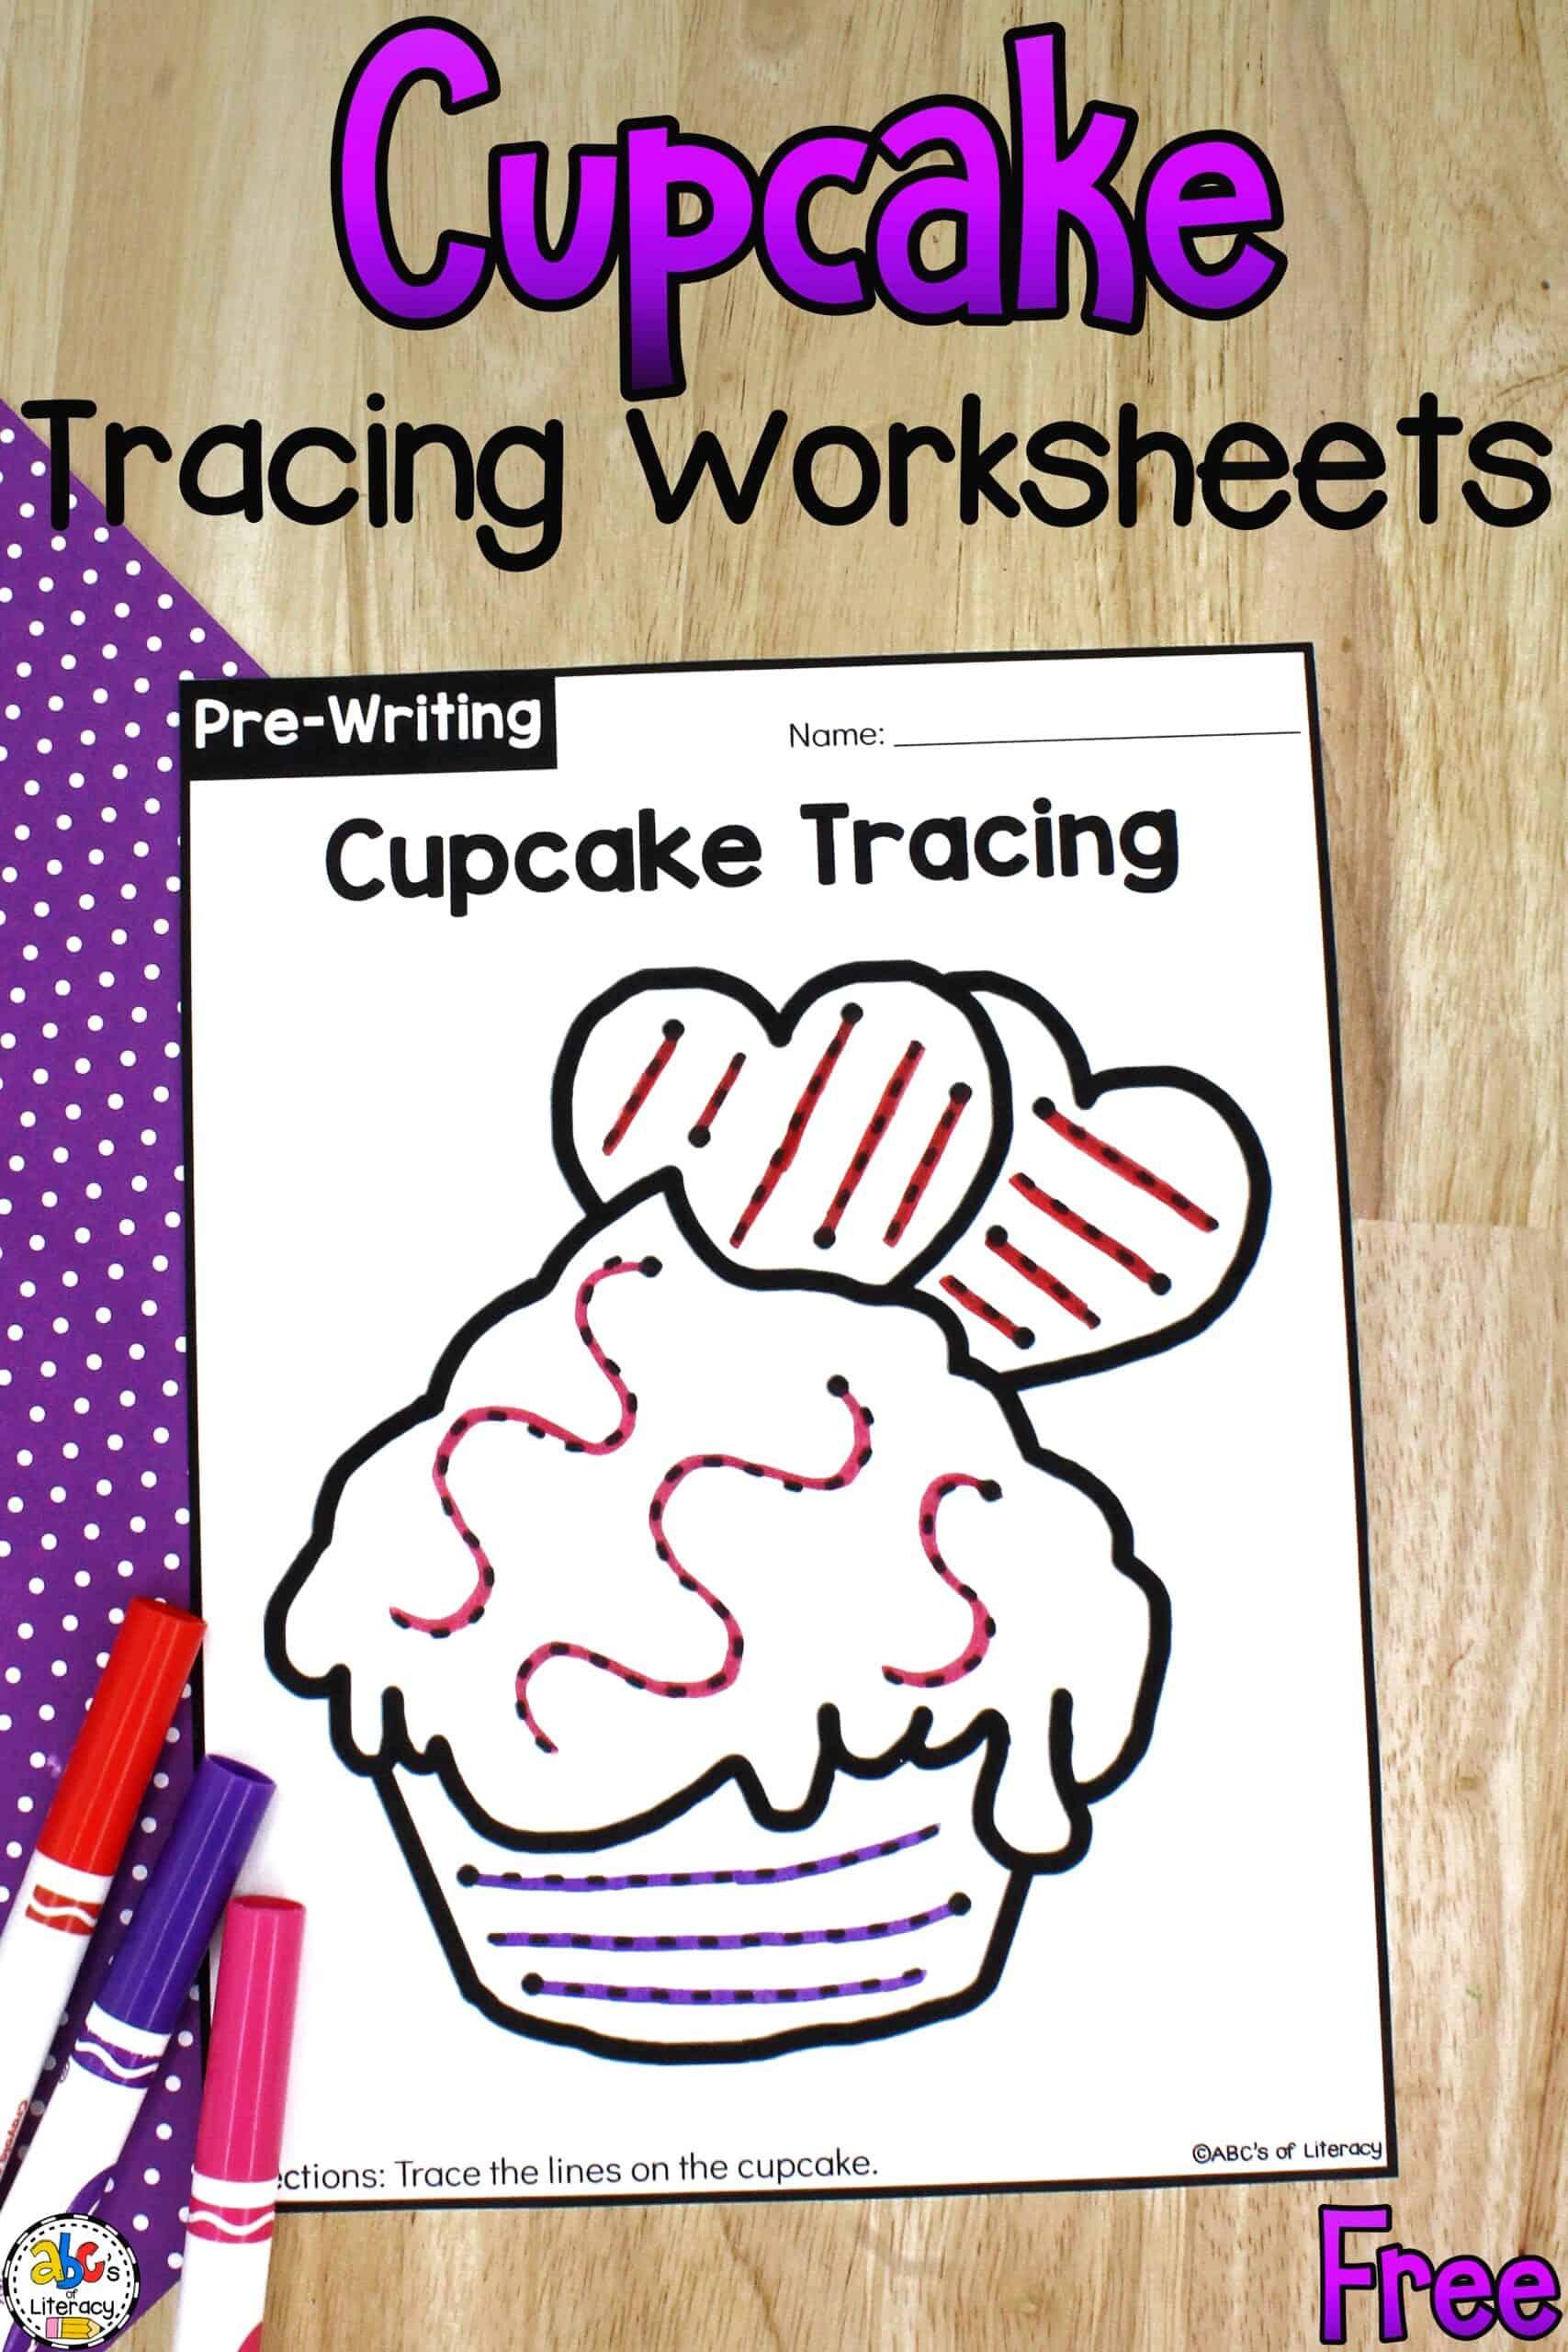 Cupcake Tracing Worksheets